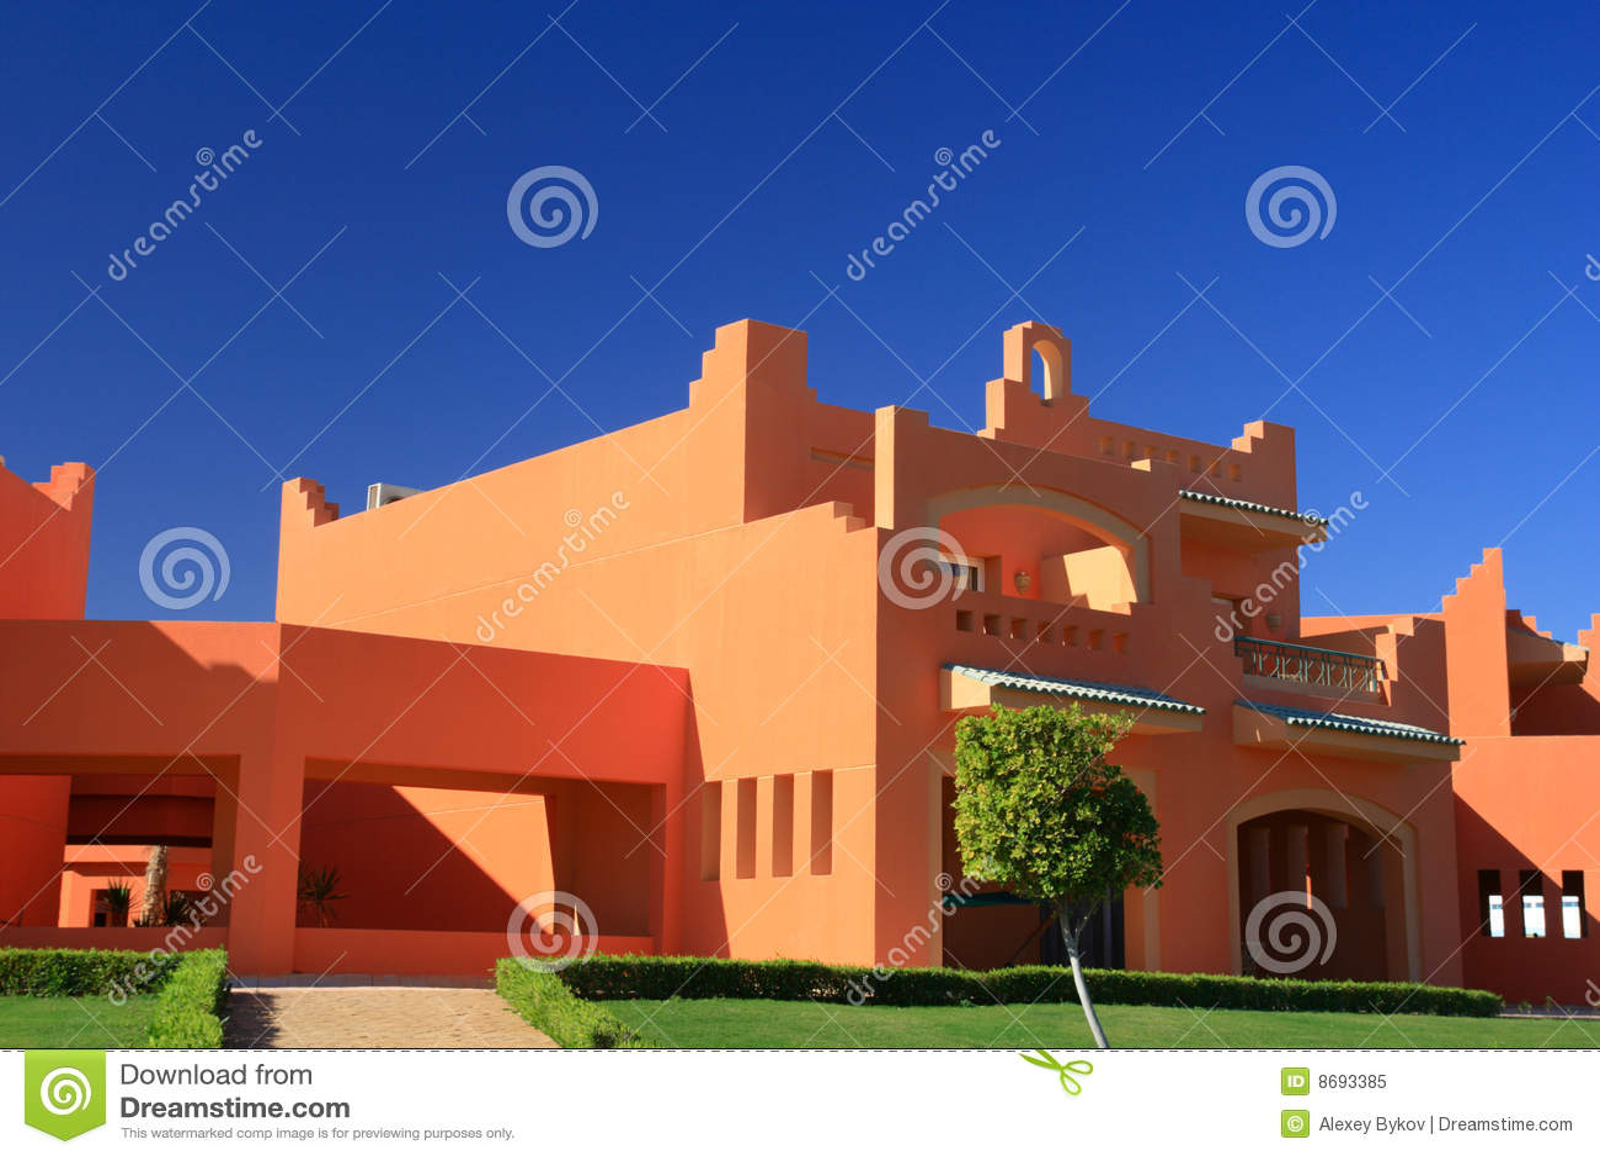 Casa no estilo rabe foto de stock royalty free imagem - Casas estilo arabe ...